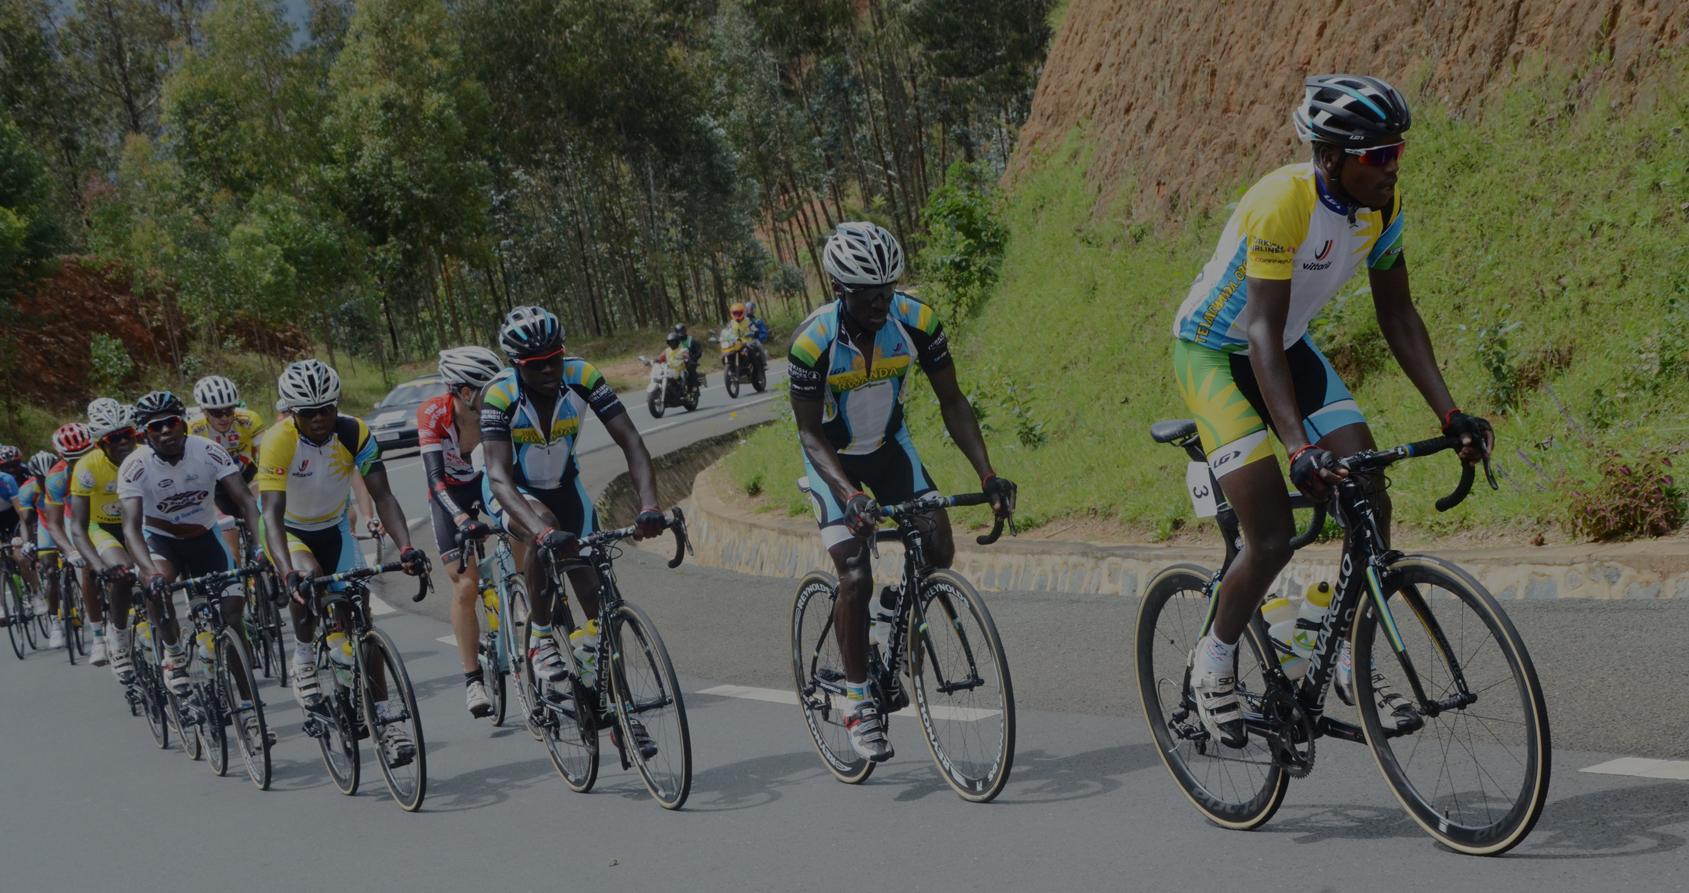 ulyces-tourdurwanda-couv01